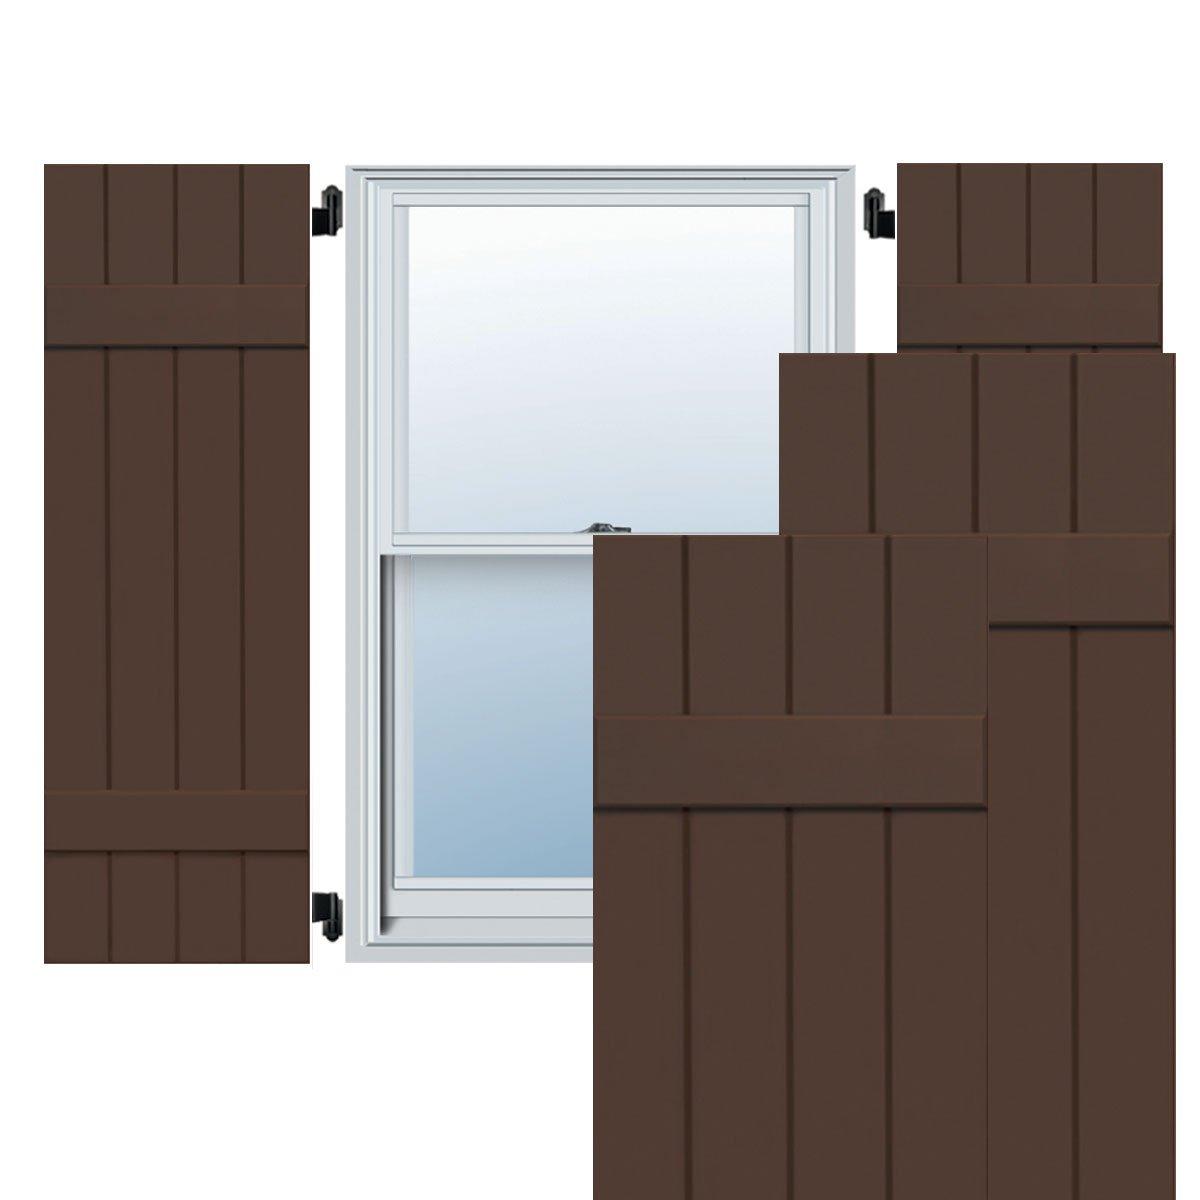 Ekena Millwork CWB15X035TBC Exterior Four Board Composite Wood Board-N-Batten Shutters with Installation Brackets 15W x 35H Per Pair Tudor Brown